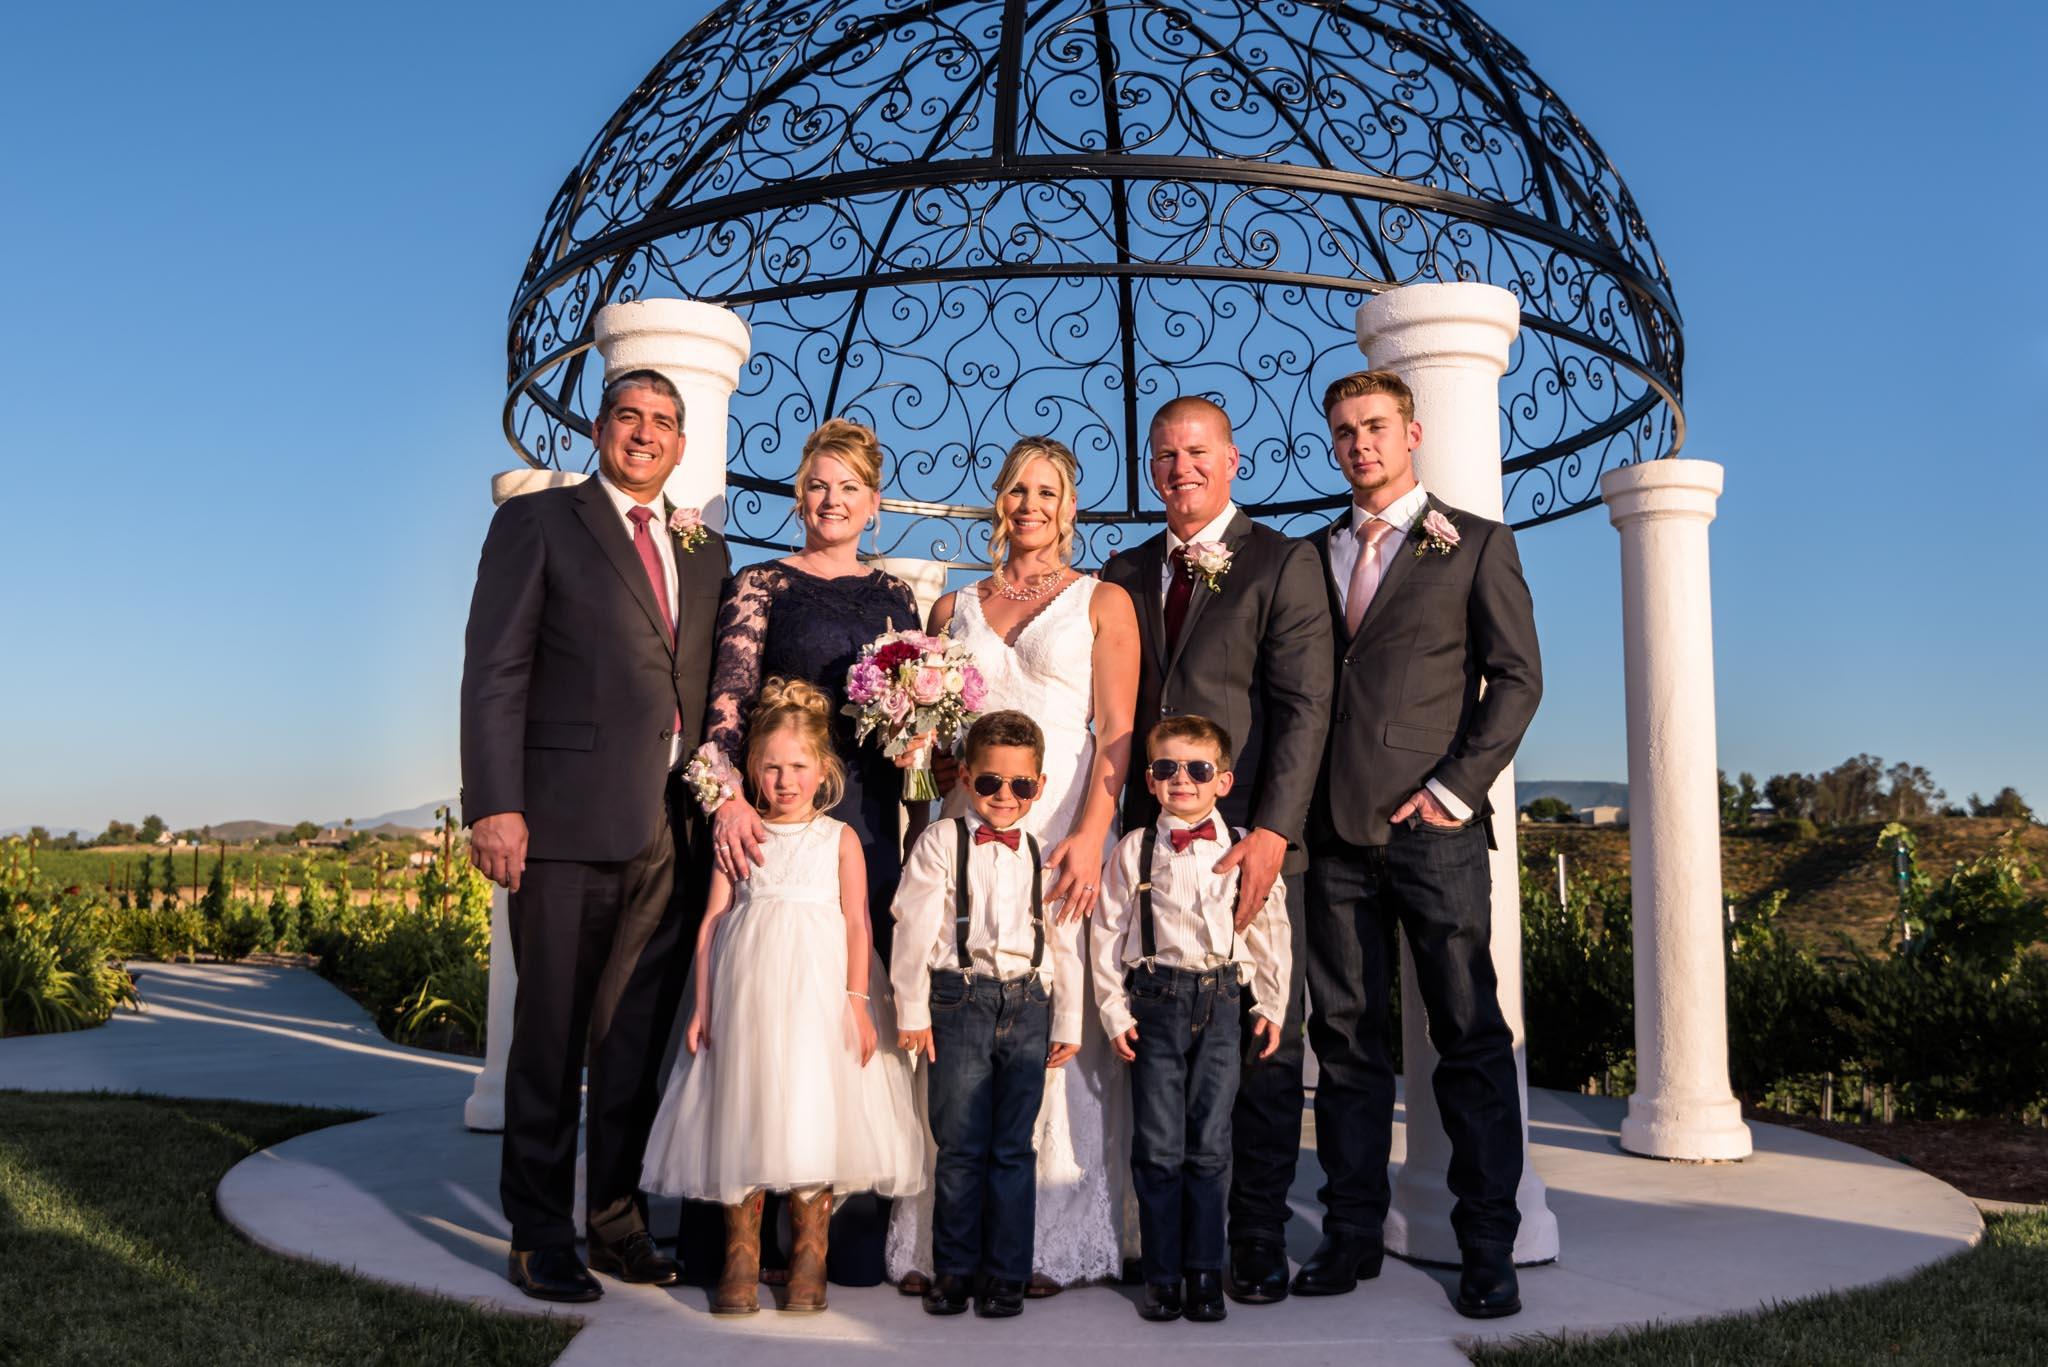 Avensole-Winery-Temecula-Wedding-Josh-and-Olivia-3678.JPG